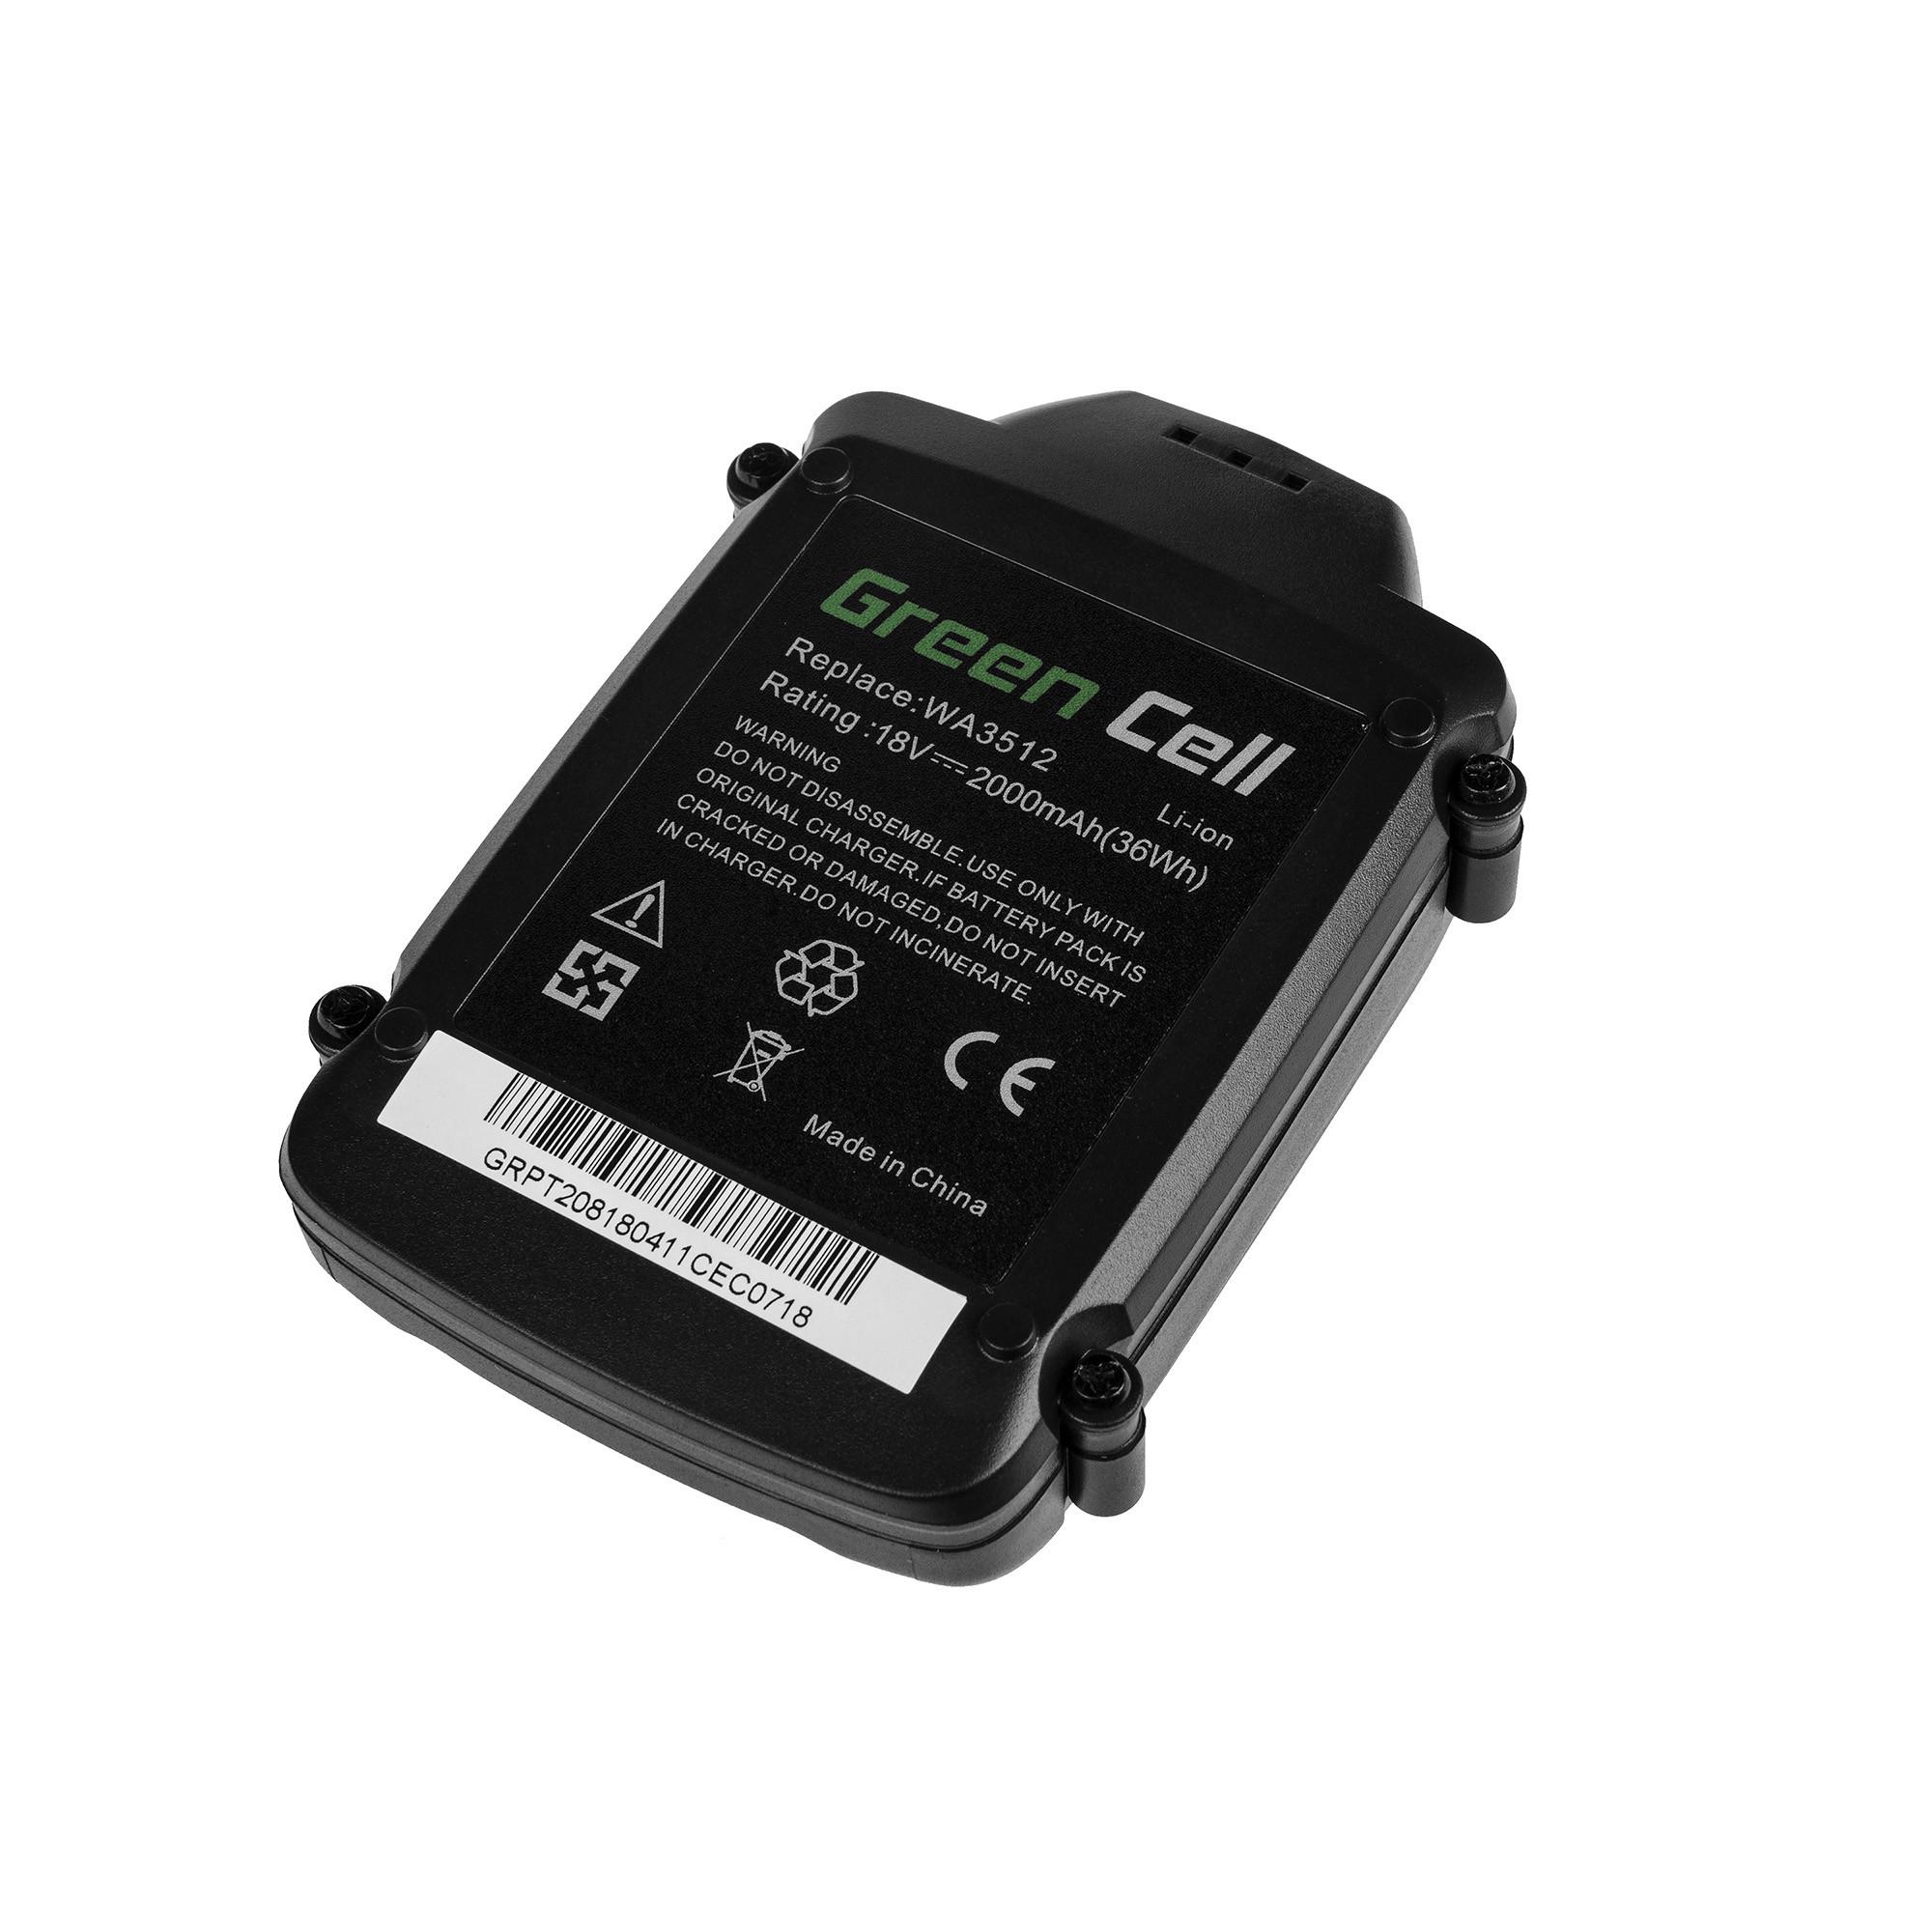 Green Cellverktygbatteri WA3511 WA3512 WA3516 WA3523 för WORX WG151 WG251 WG540 WU289 WU381 WX163 WX164 WX368 AL-KO GTli 18